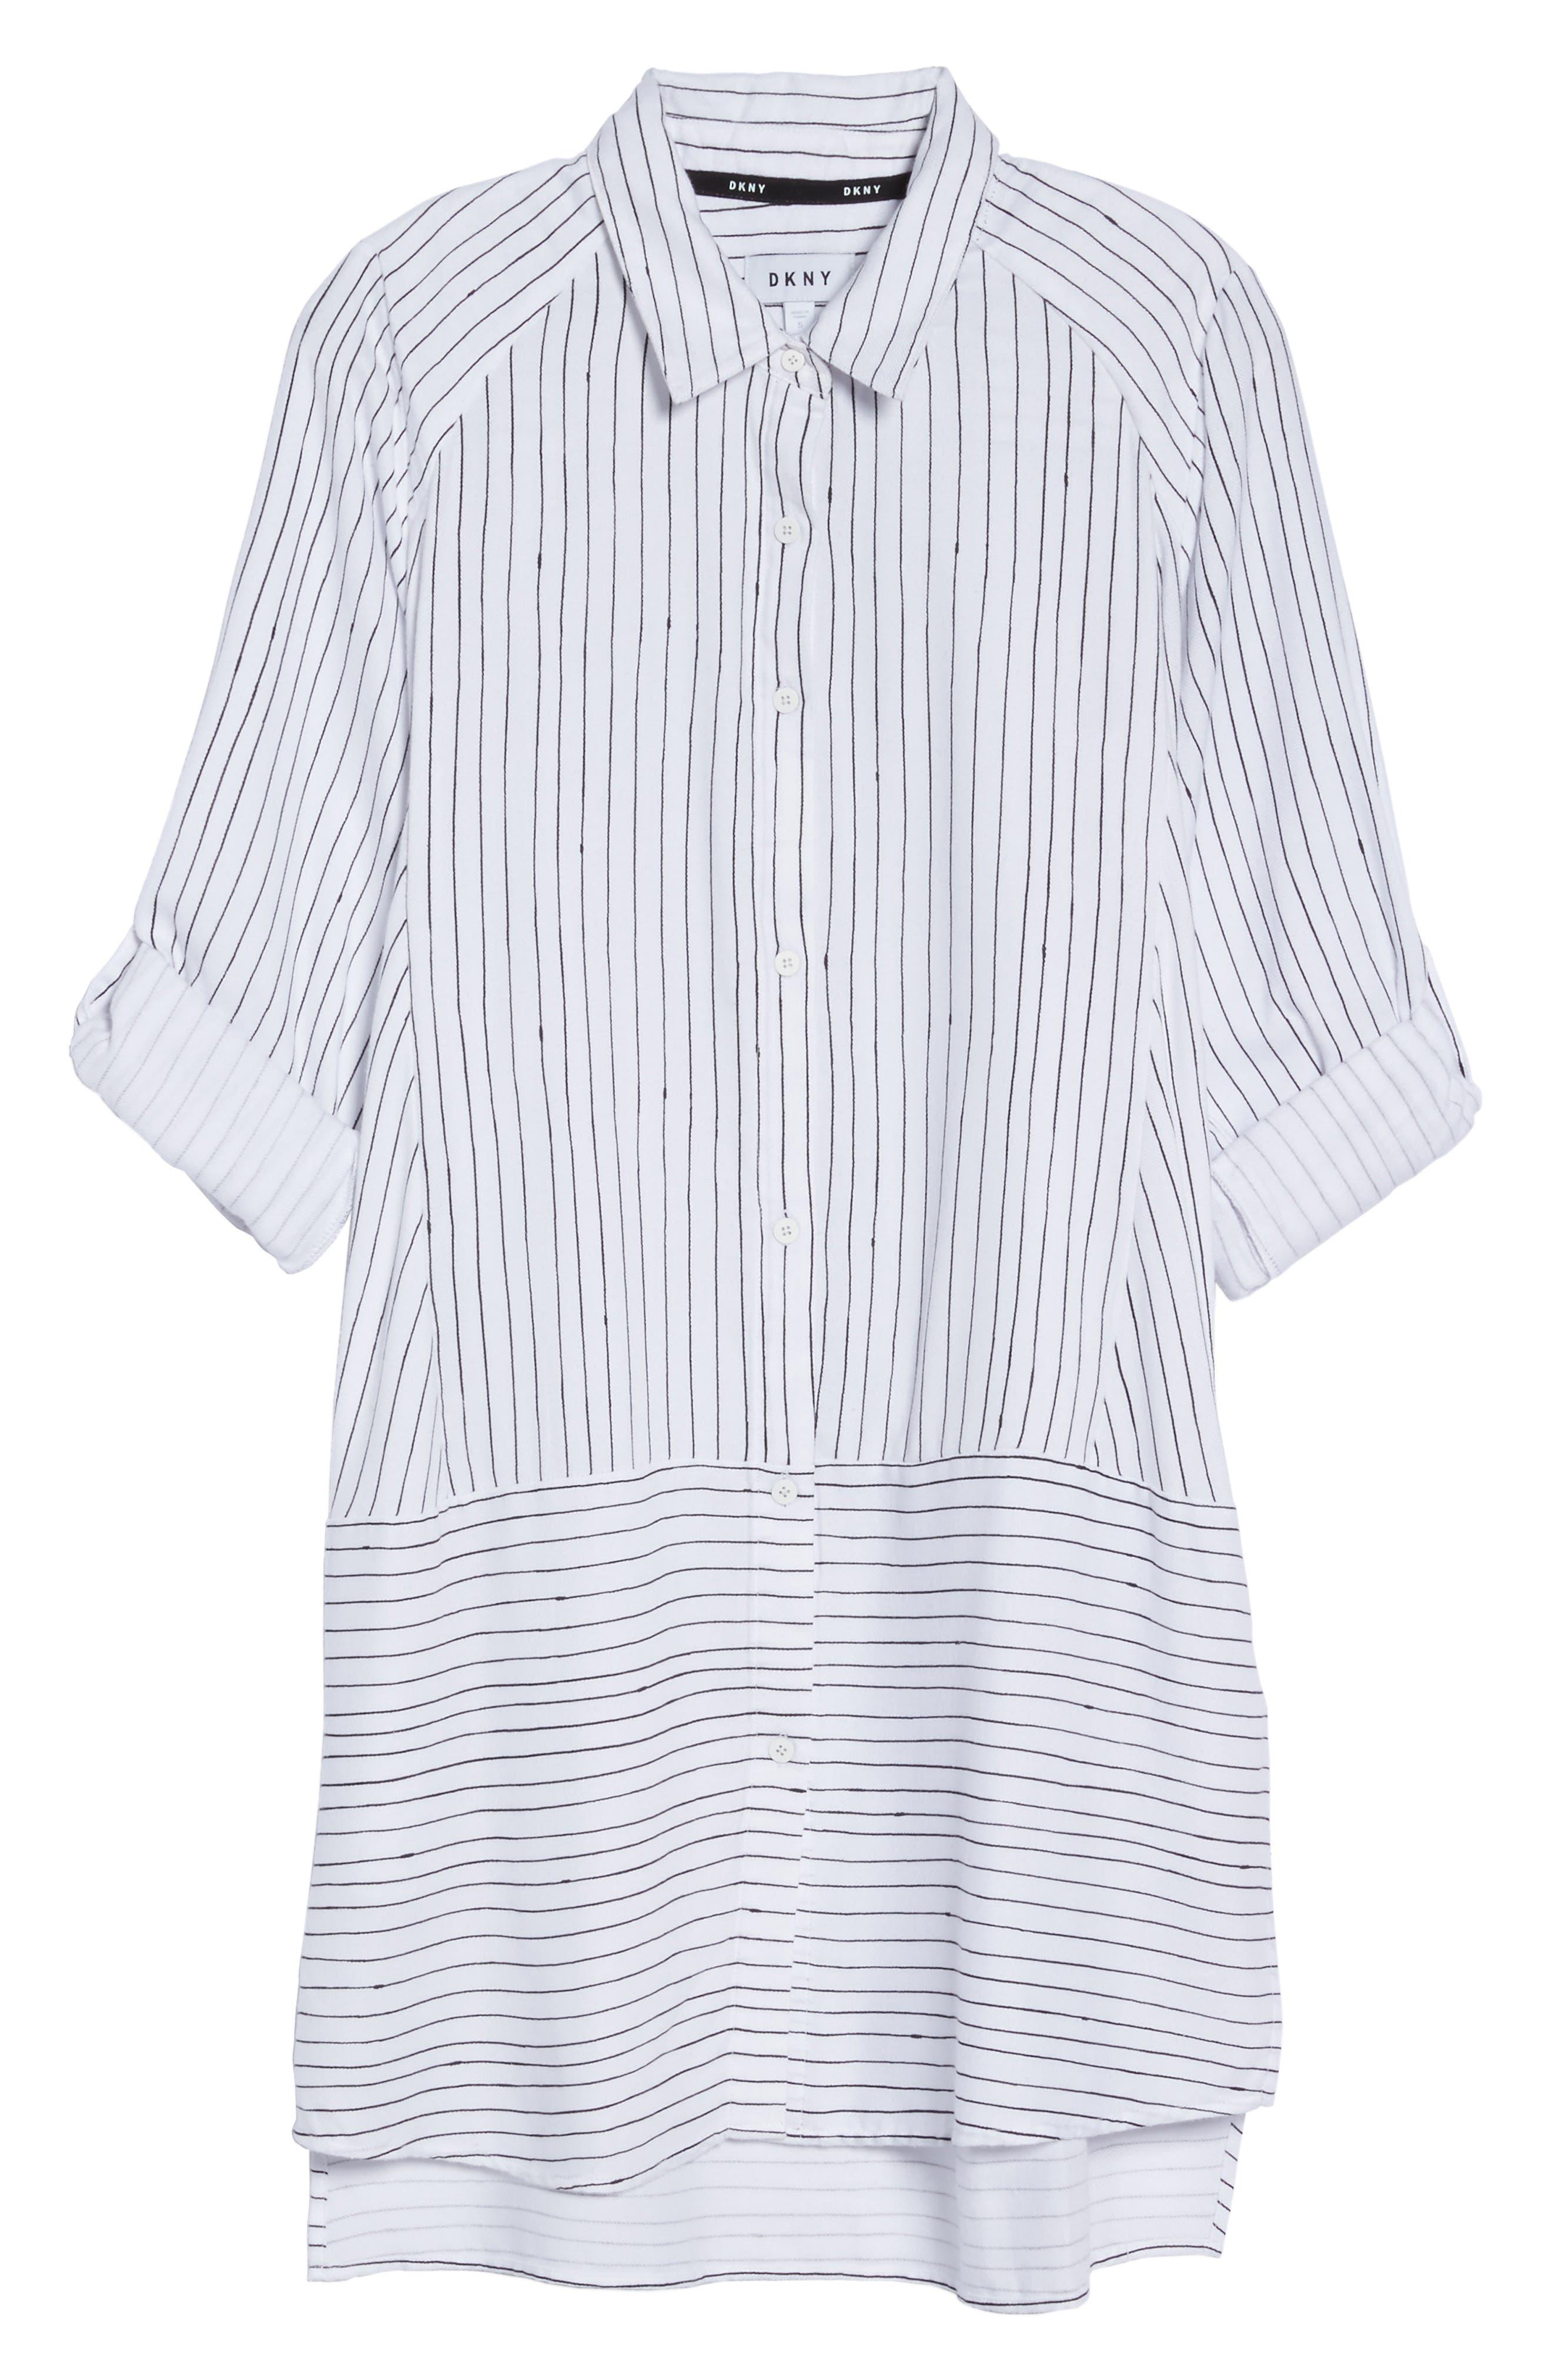 Stripe Sleep Shirt,                             Alternate thumbnail 4, color,                             White Stripe Print